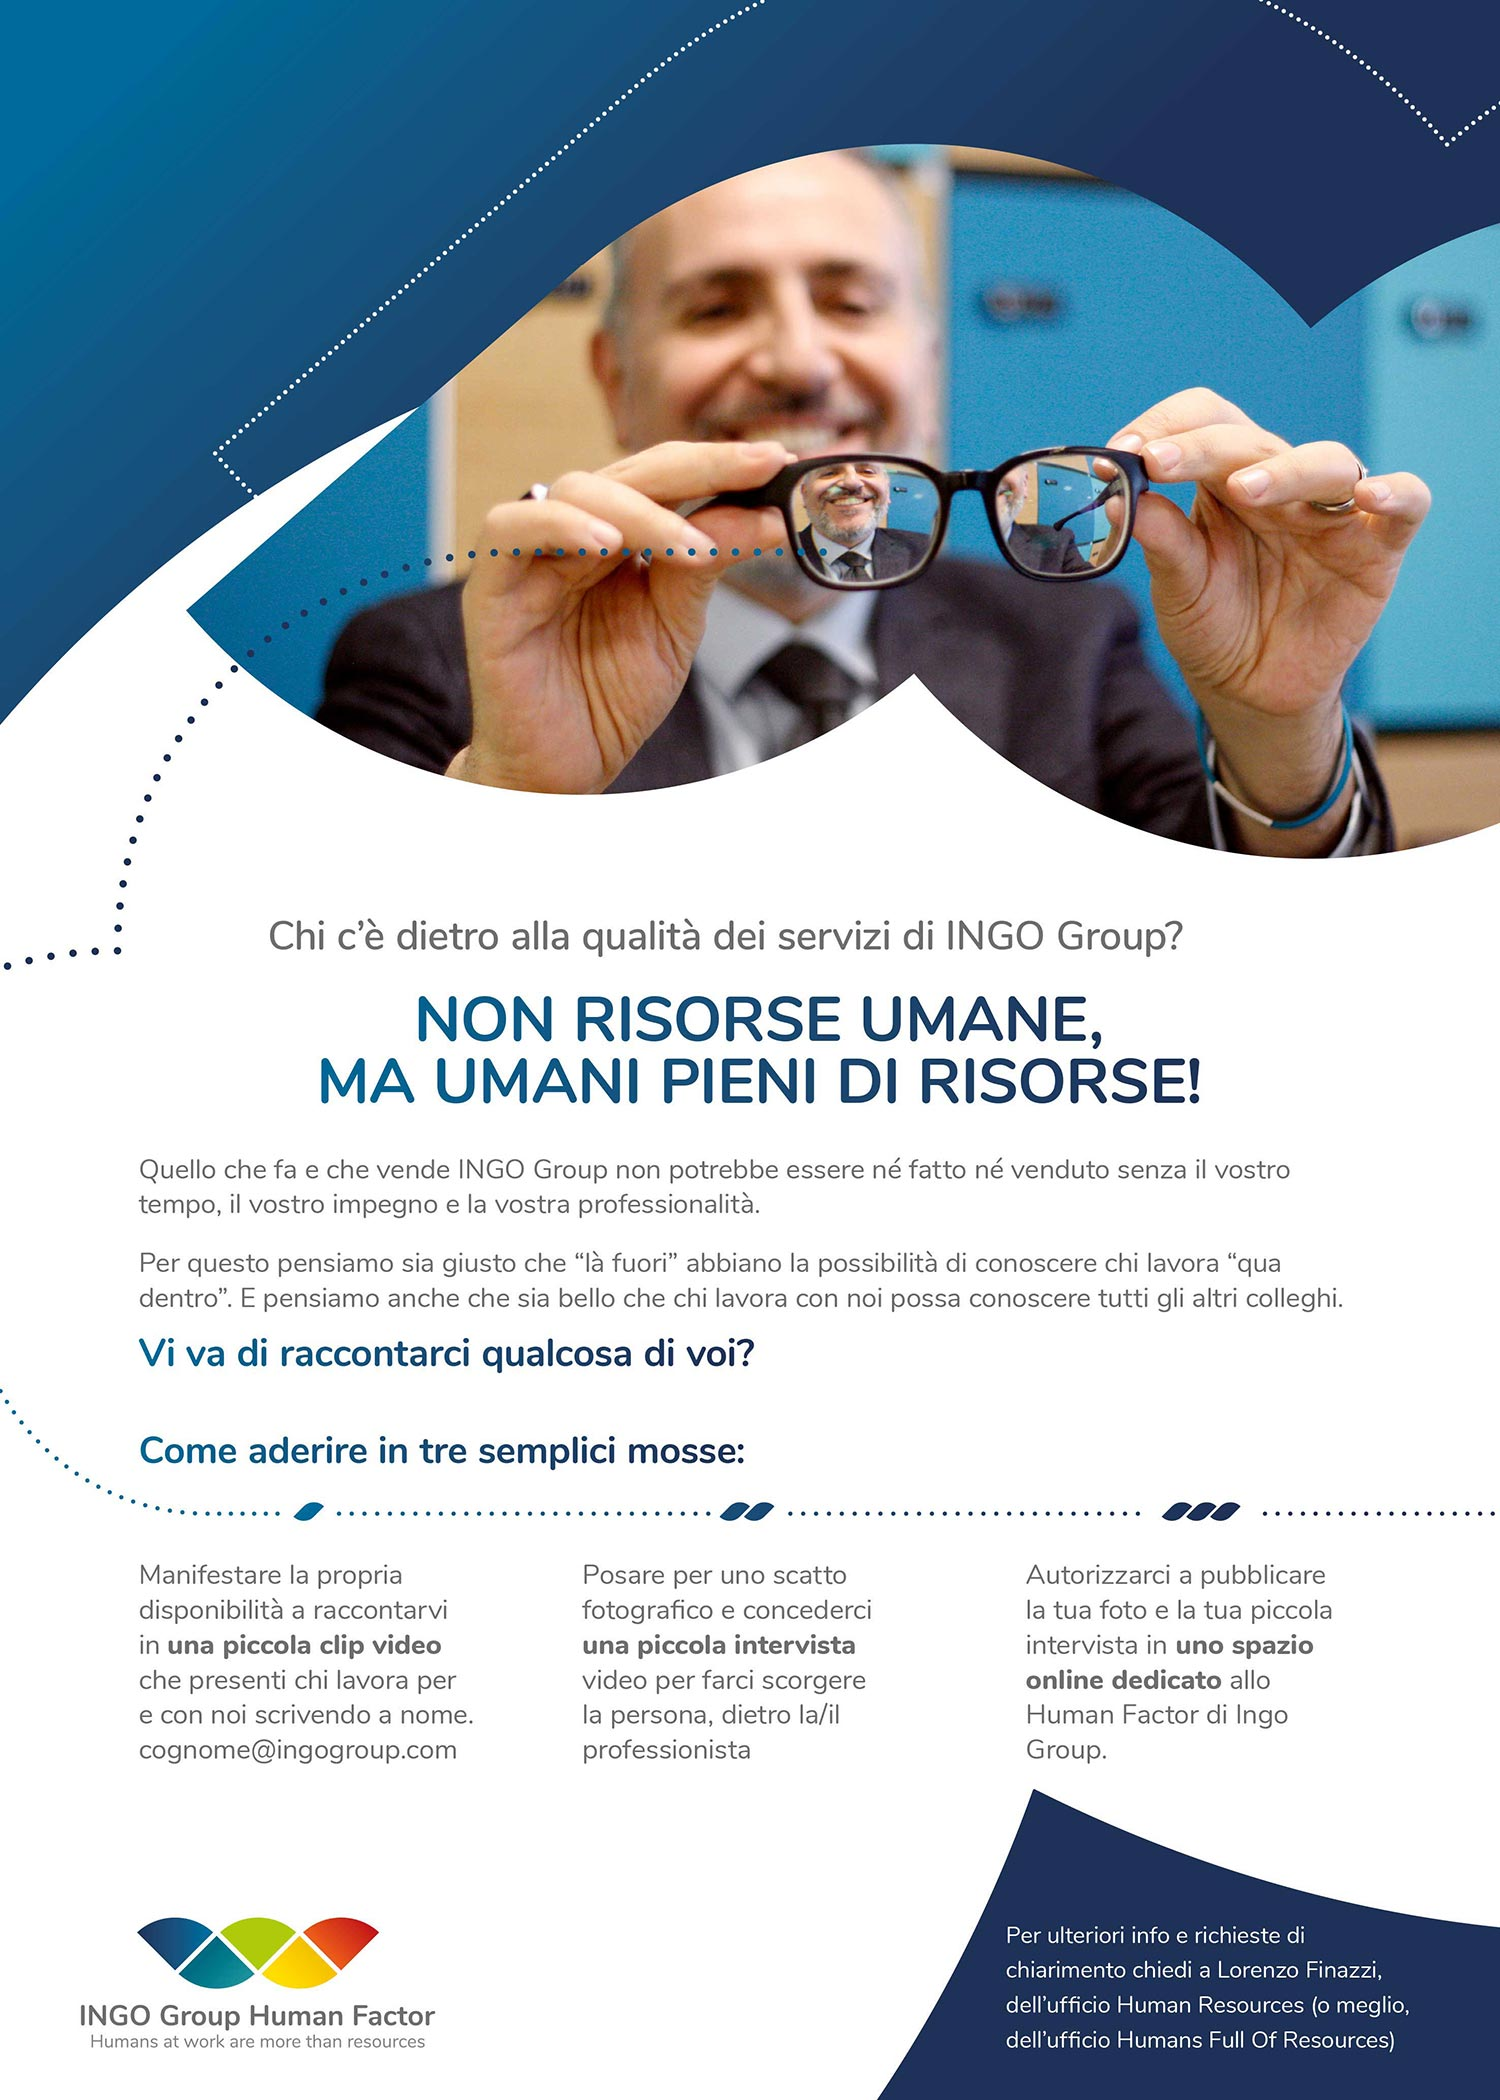 INGO_Campagna-adesioni_ingo